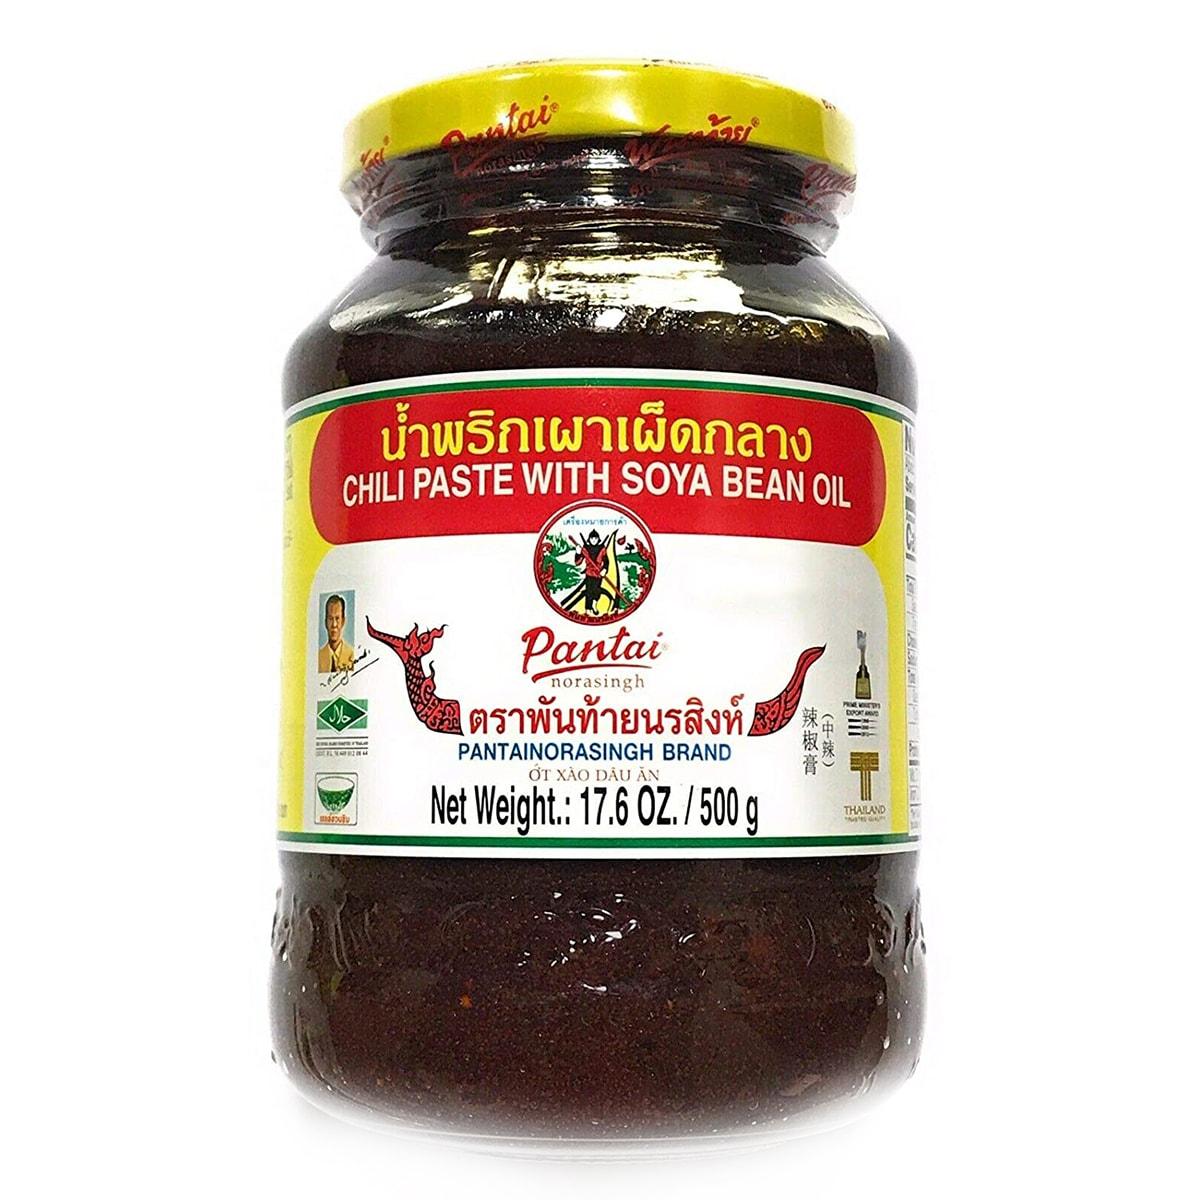 Buy Pantainorasingh Chili Paste with Soya Bean Oil - 500 gm